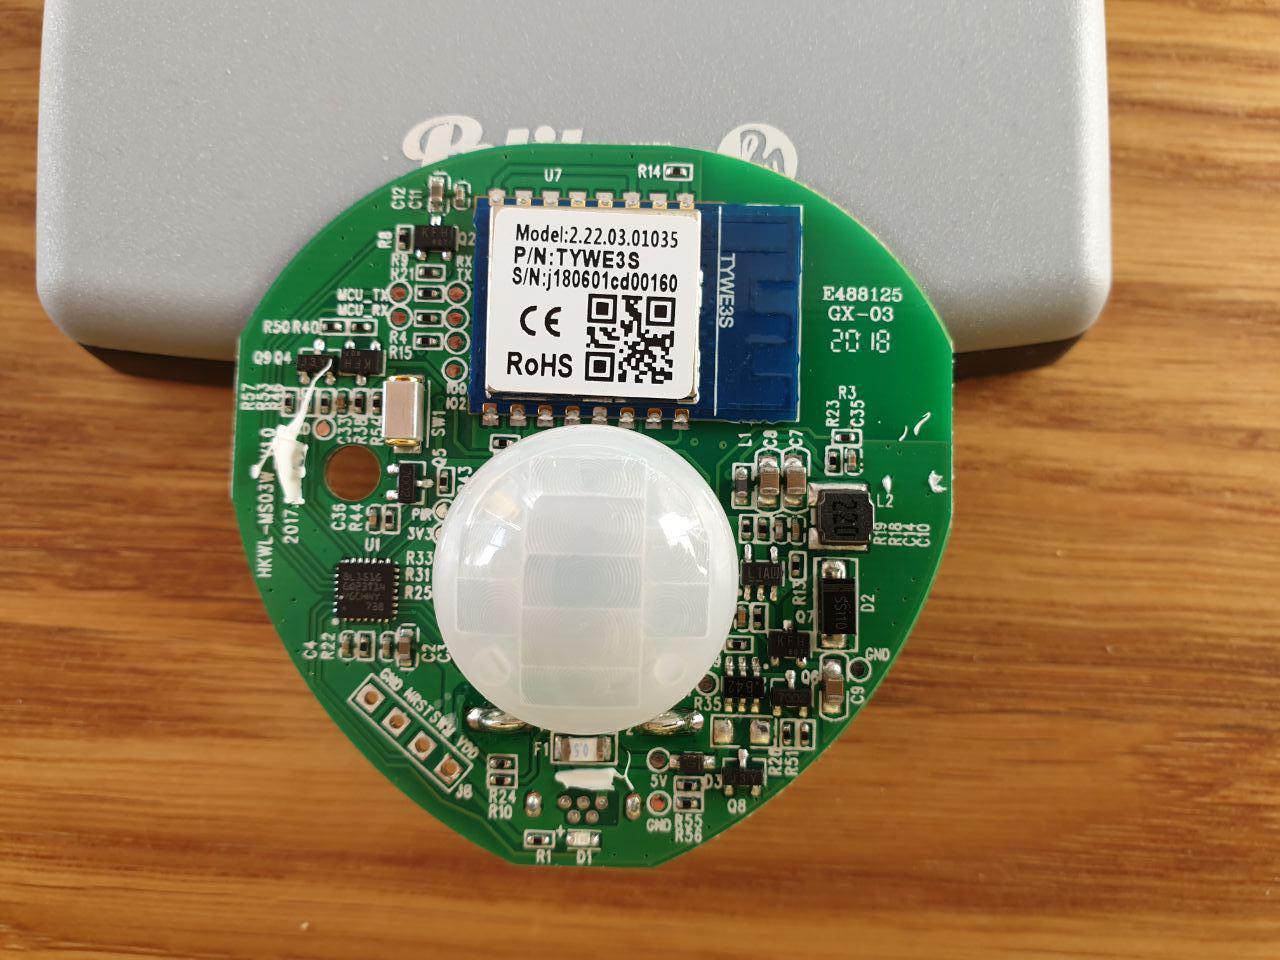 Tuya PIR Sensor XMD-101 app / NX-4469-675 · Issue #5398